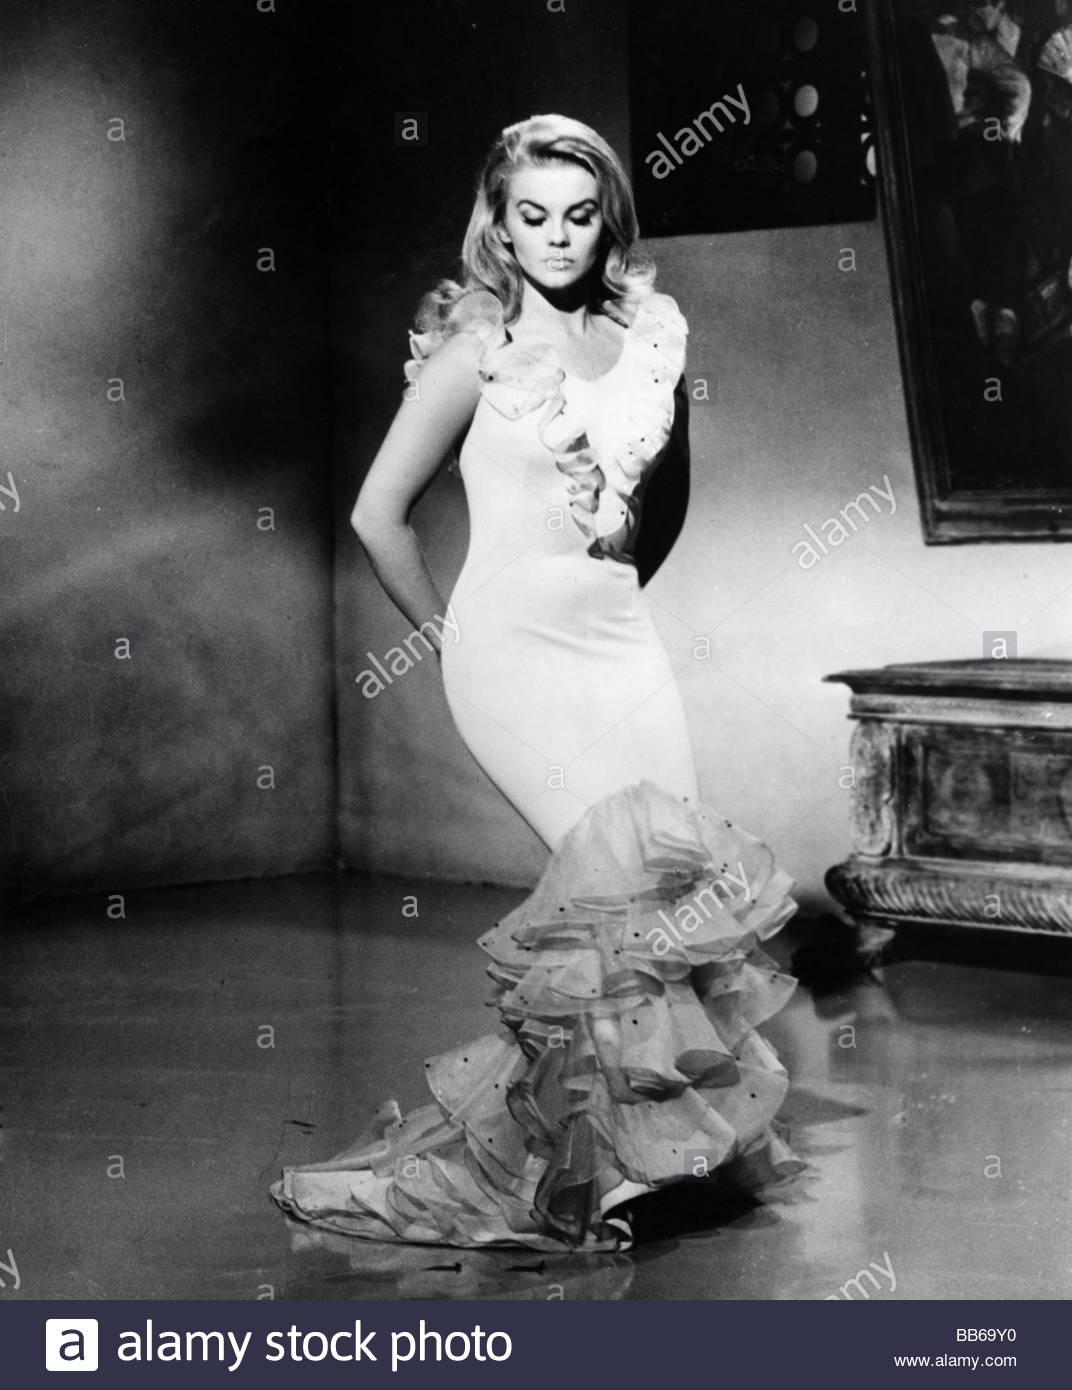 Ann-Margret, * 28.4.1941, Swedish actress, full length, scene, movie, 'The Pleasure Seekers', USA, 1964, - Stock Image